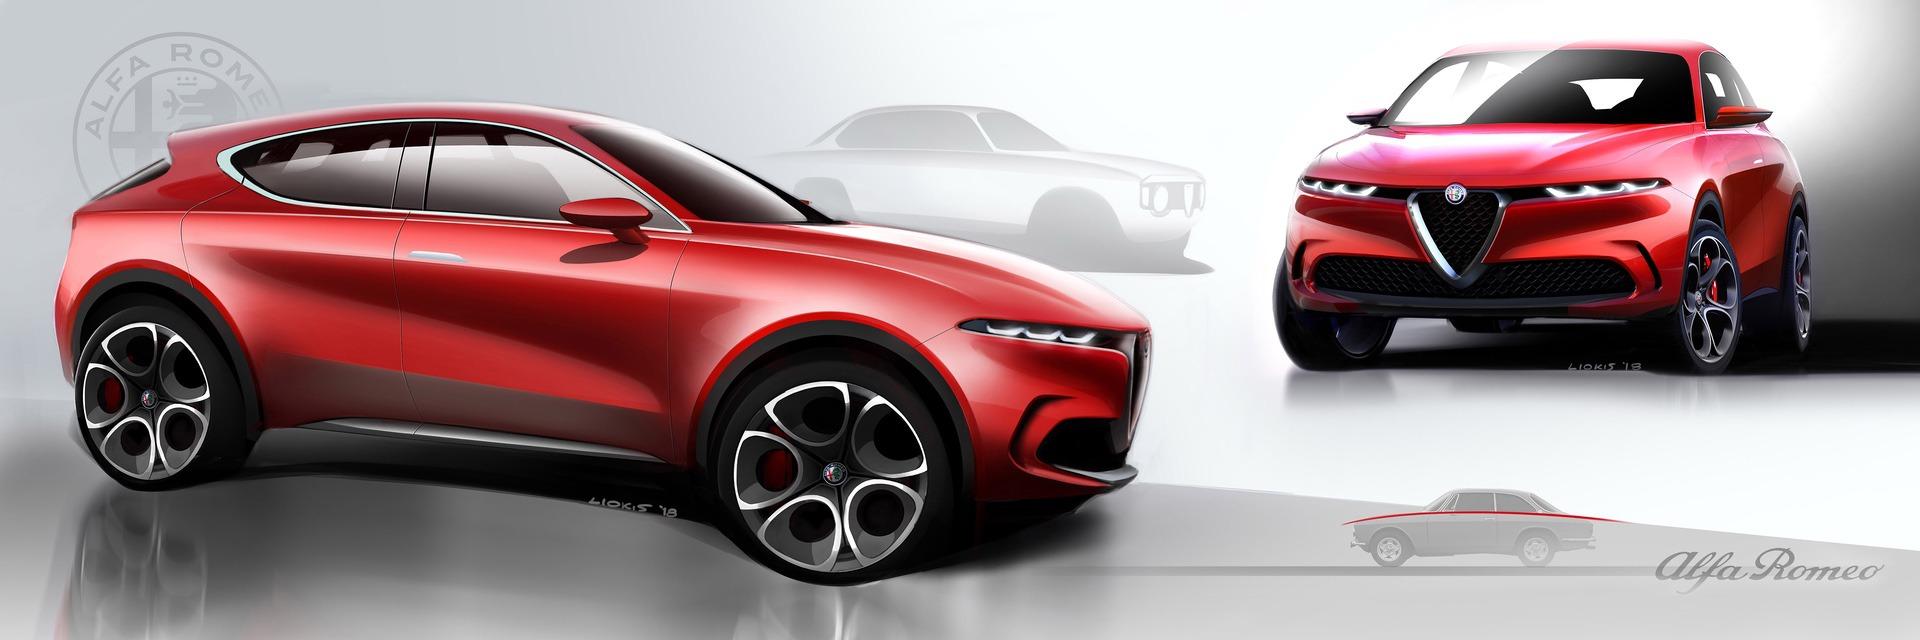 Alfa_Romeo_Tonale_Concept_0002